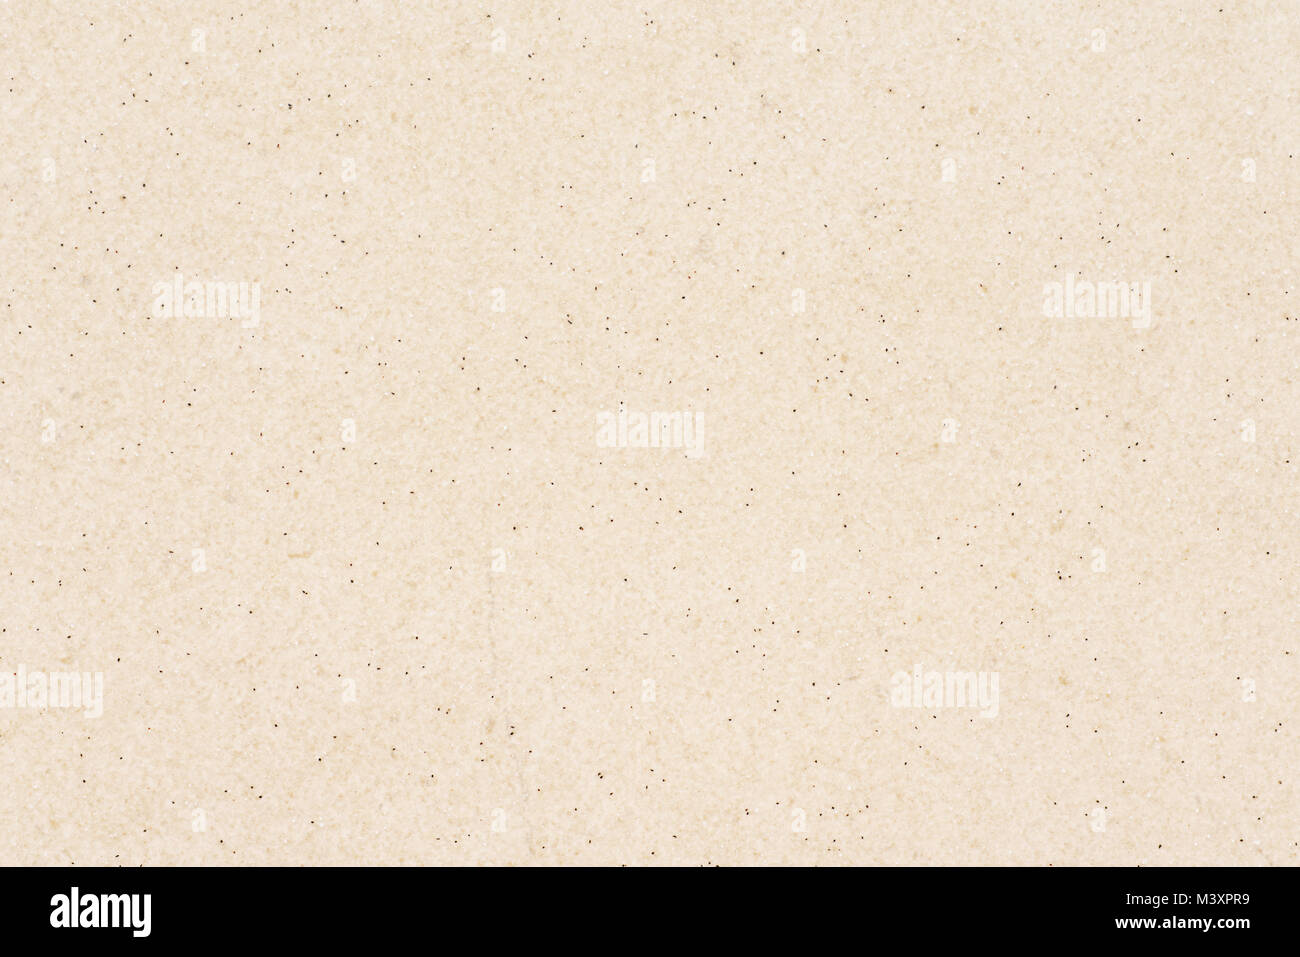 Ceramica gres porcellanato piastrella o texture pattern pietra